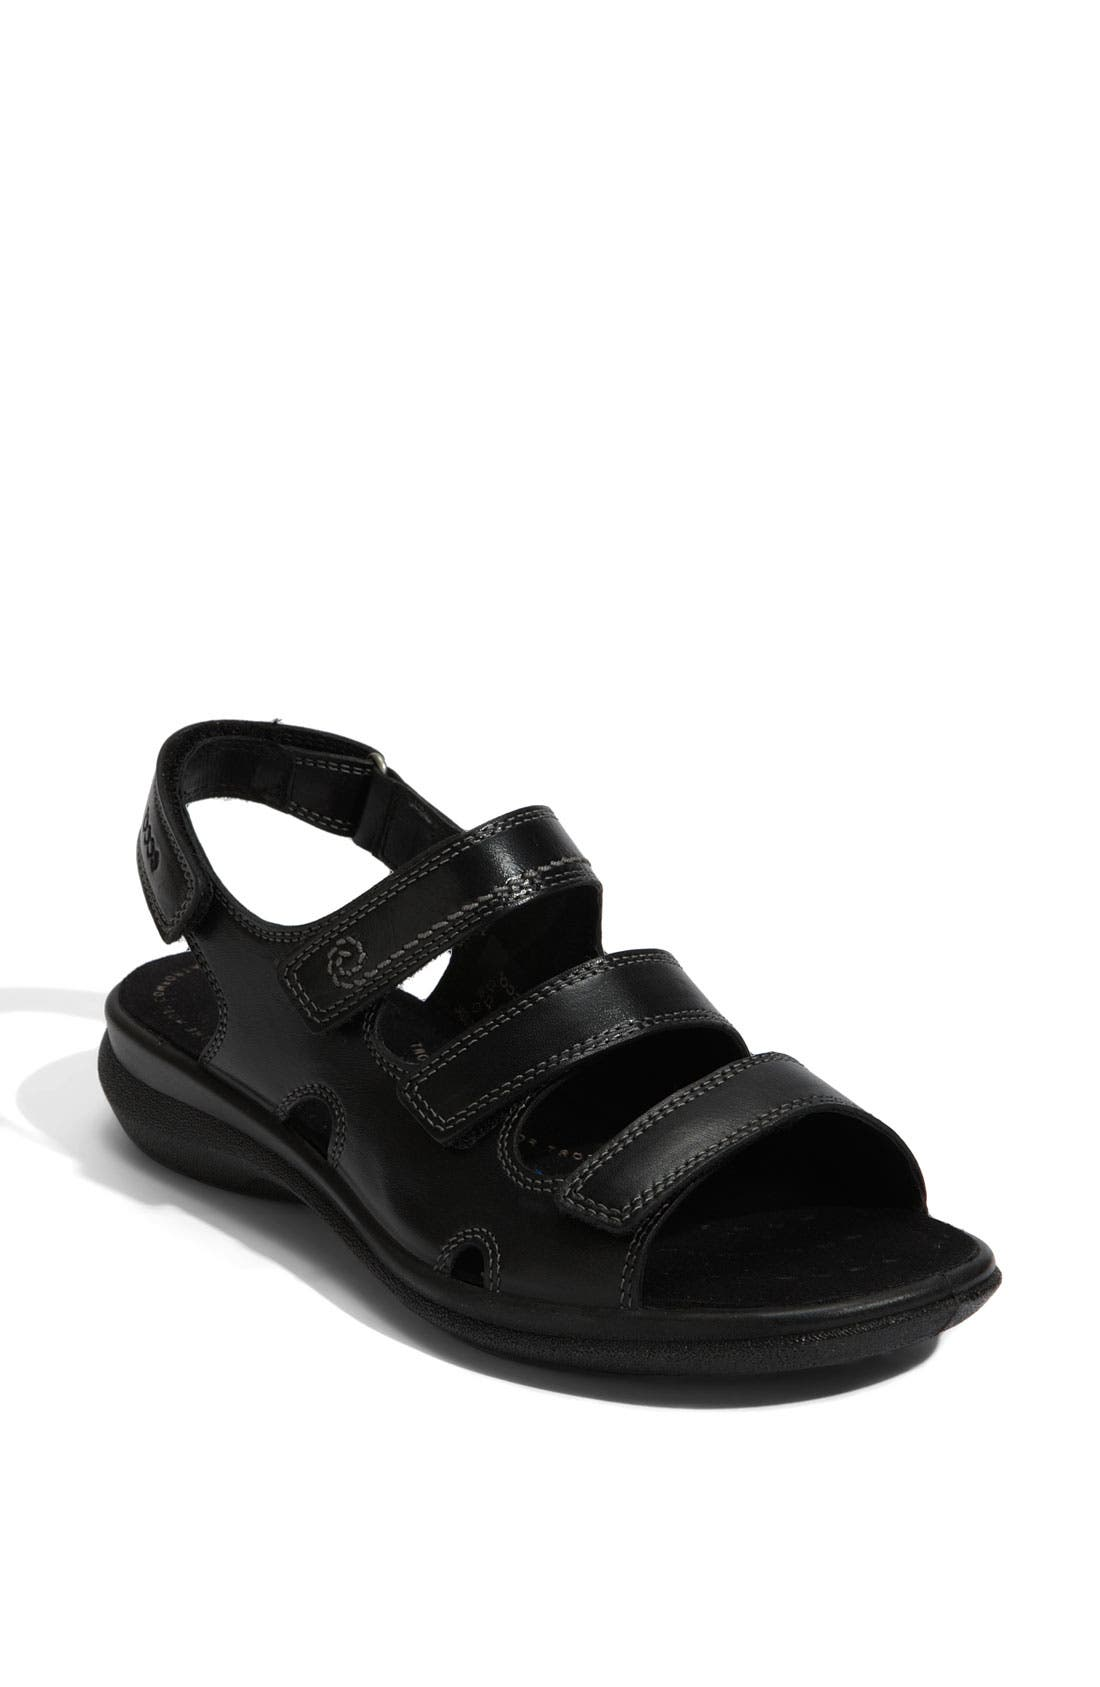 Alternate Image 1 Selected - ECCO 'Breeze' Sandal